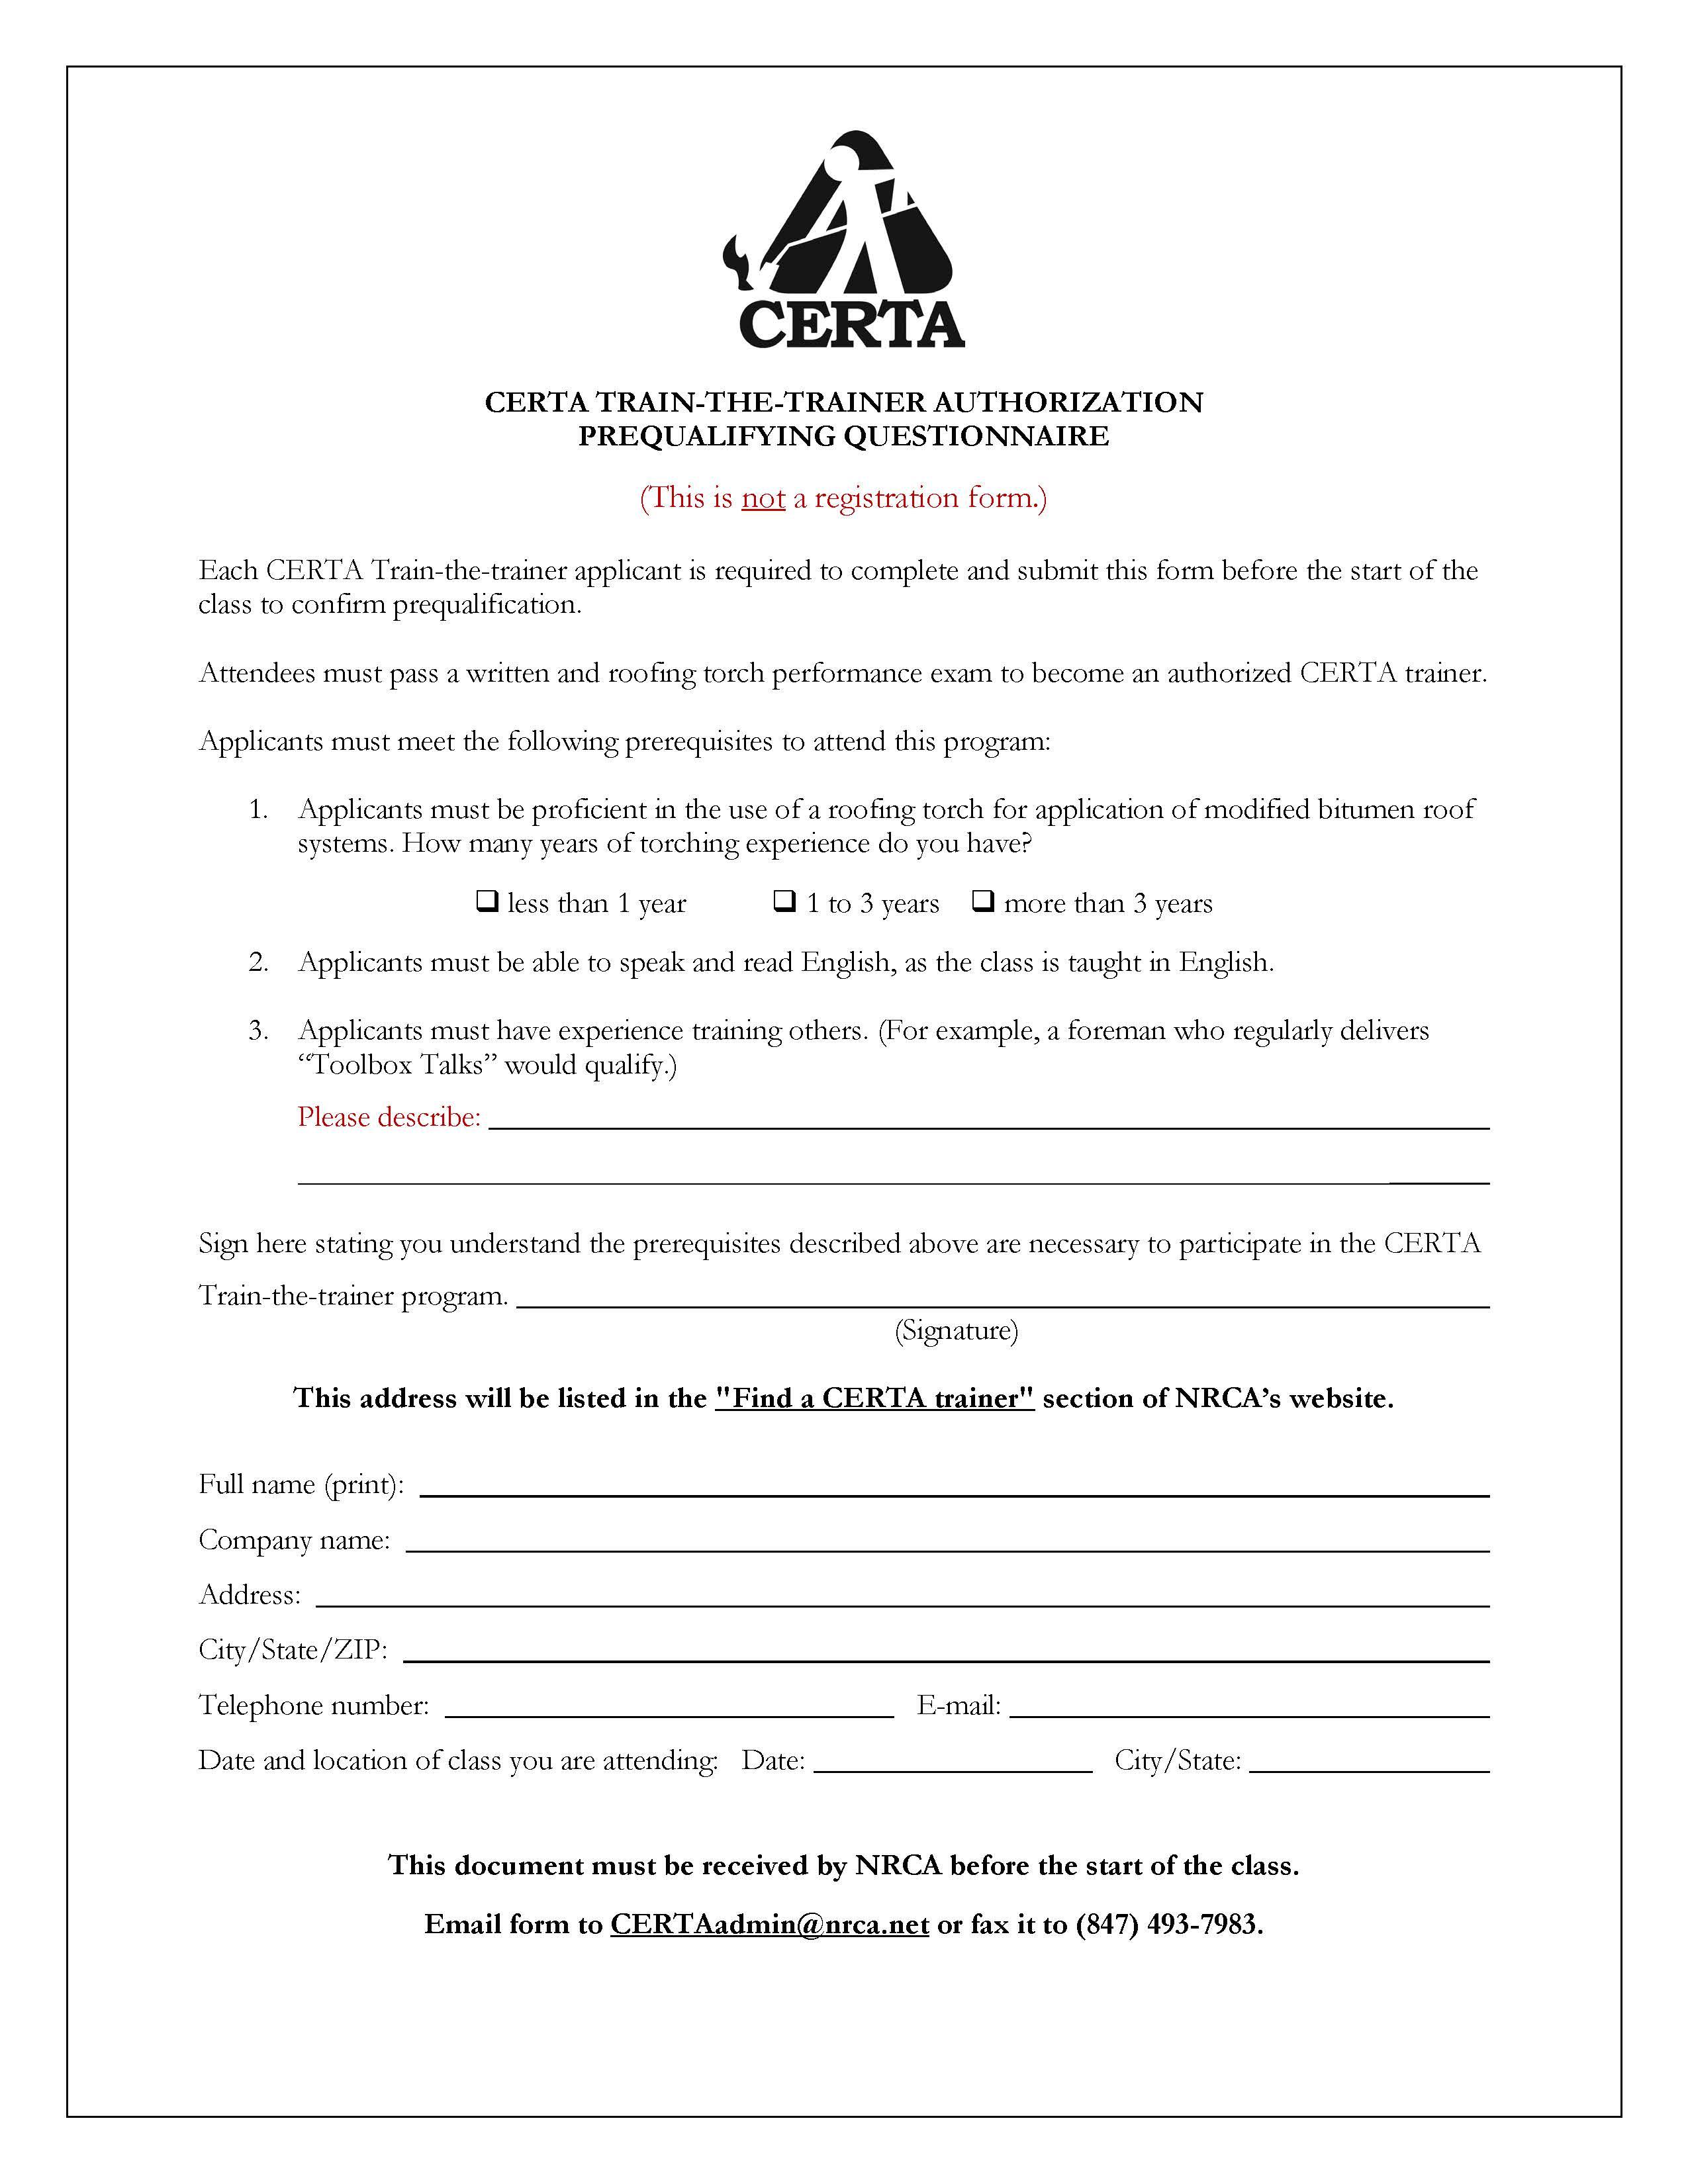 Prequalification Questionnaire 8-9-19